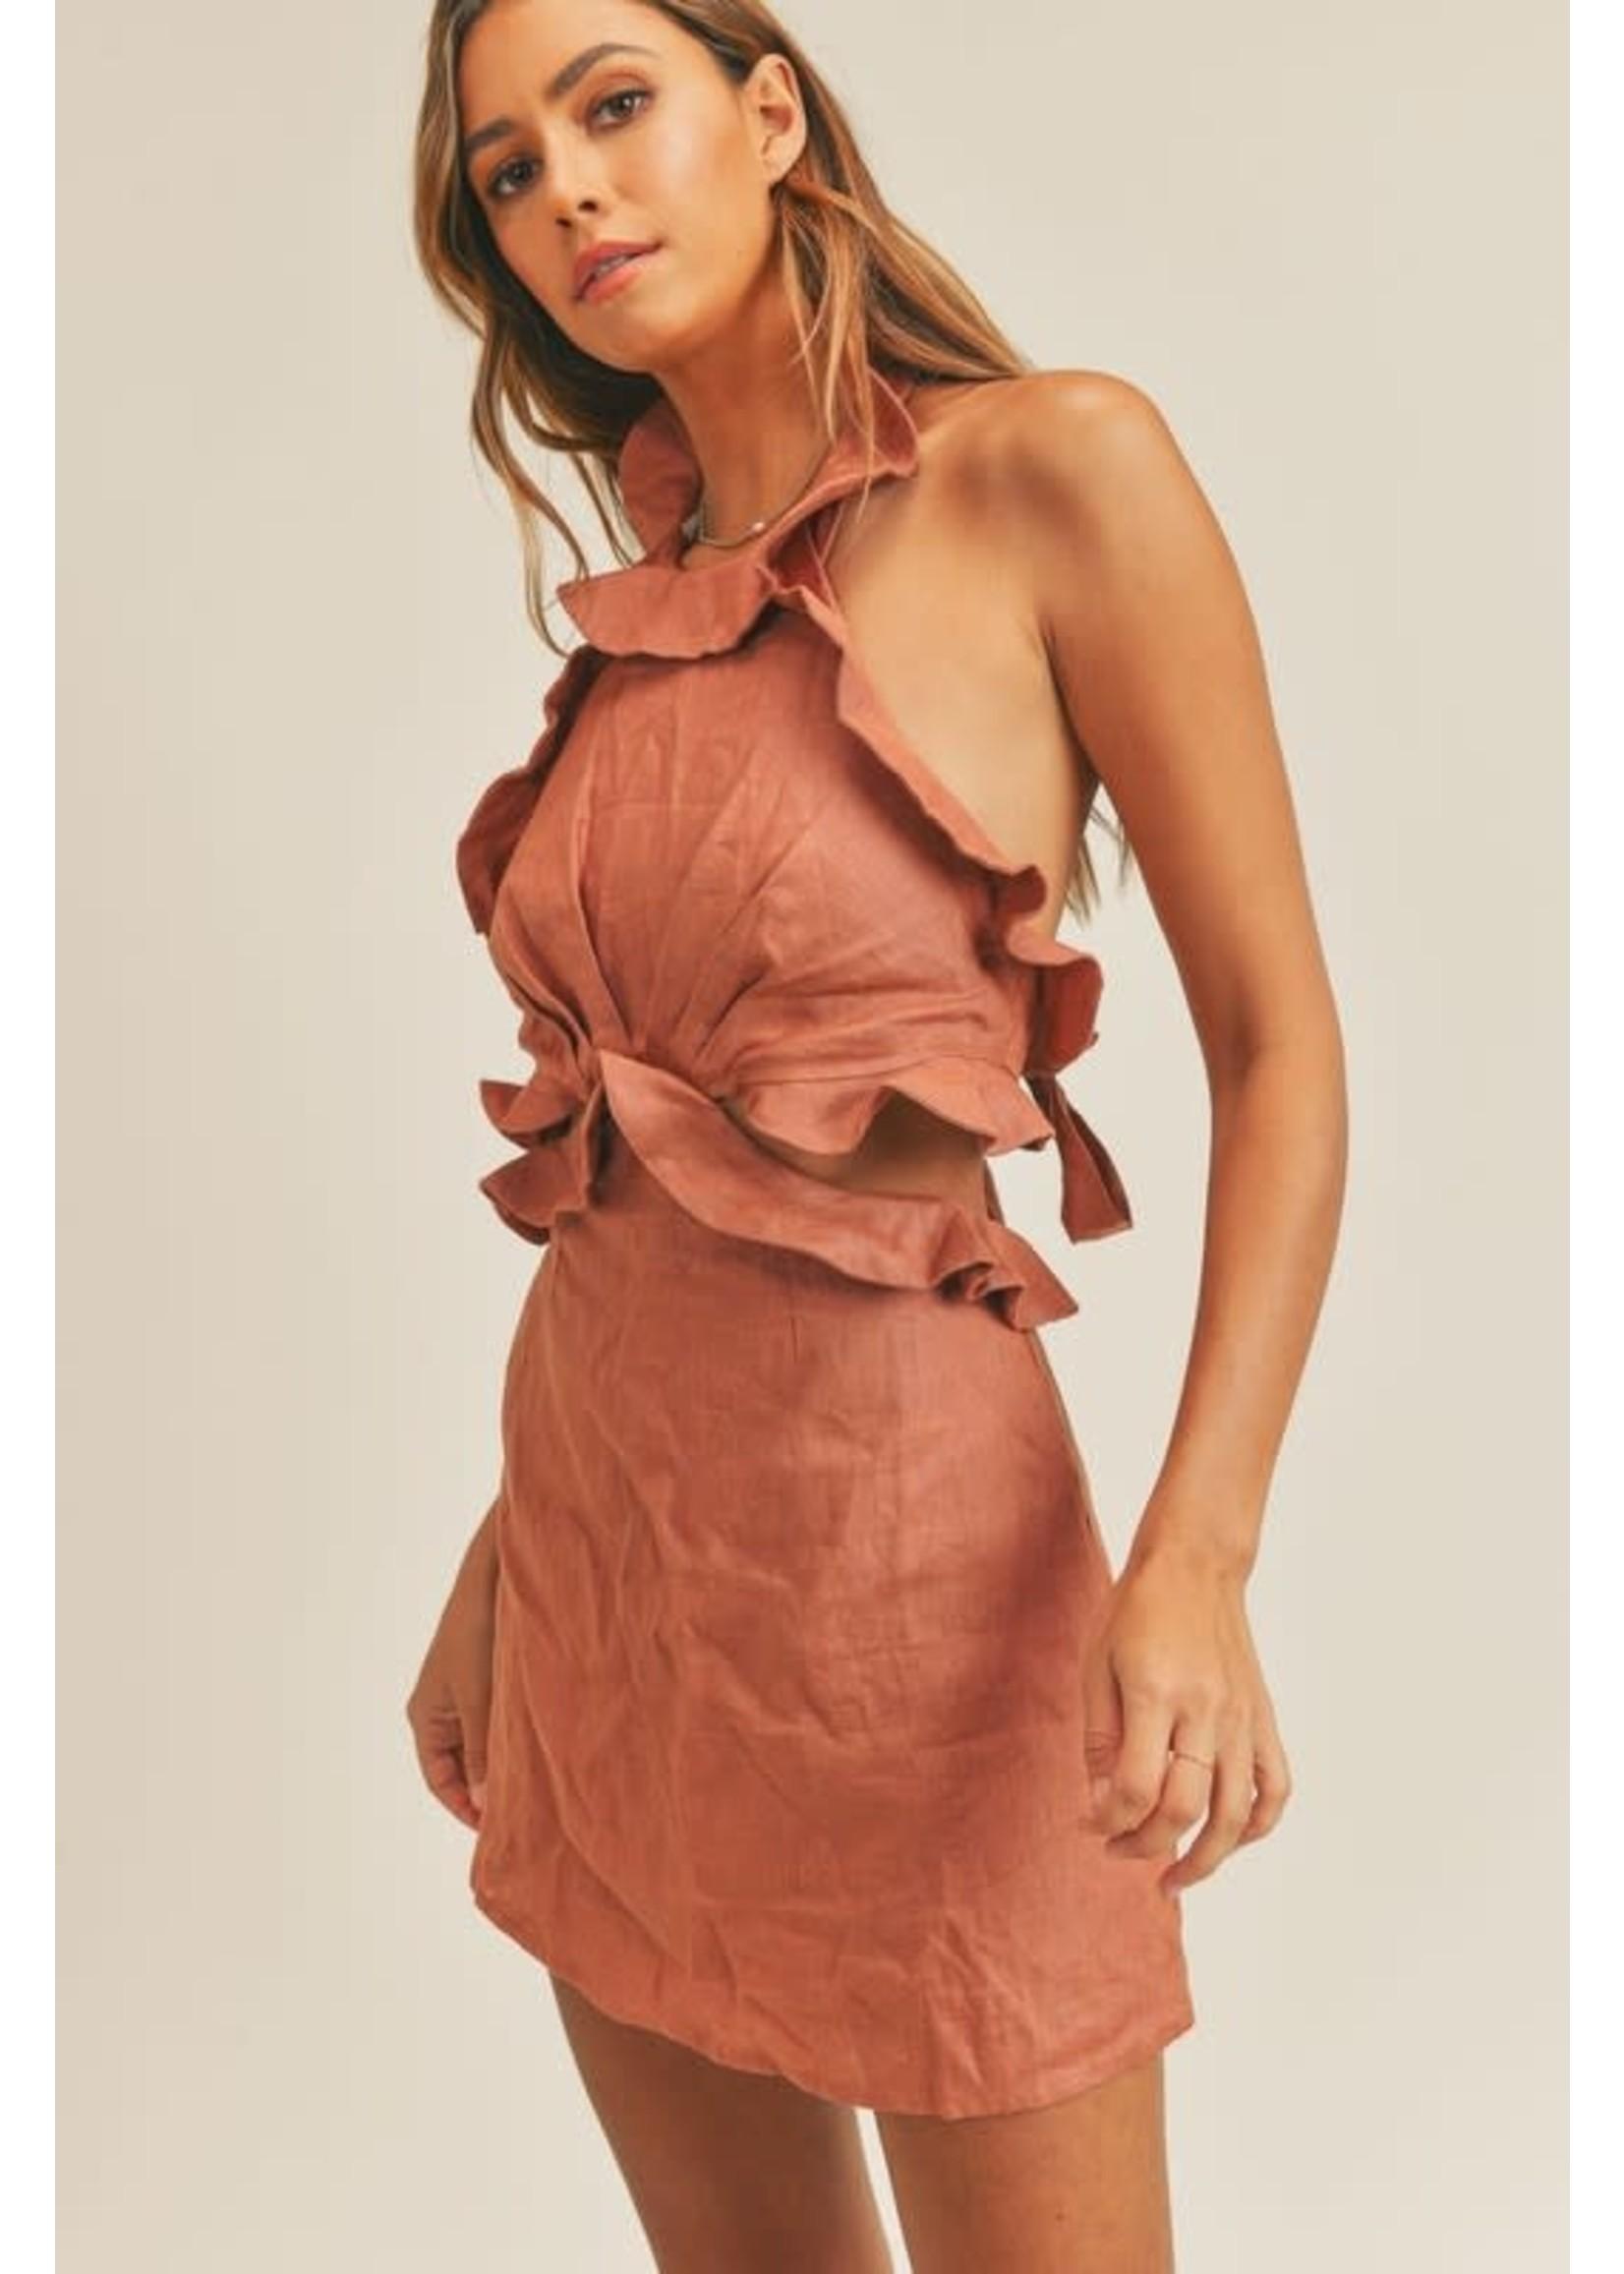 Mable Sleeveless Cut Out Ruffled Mini Dress - MD2728